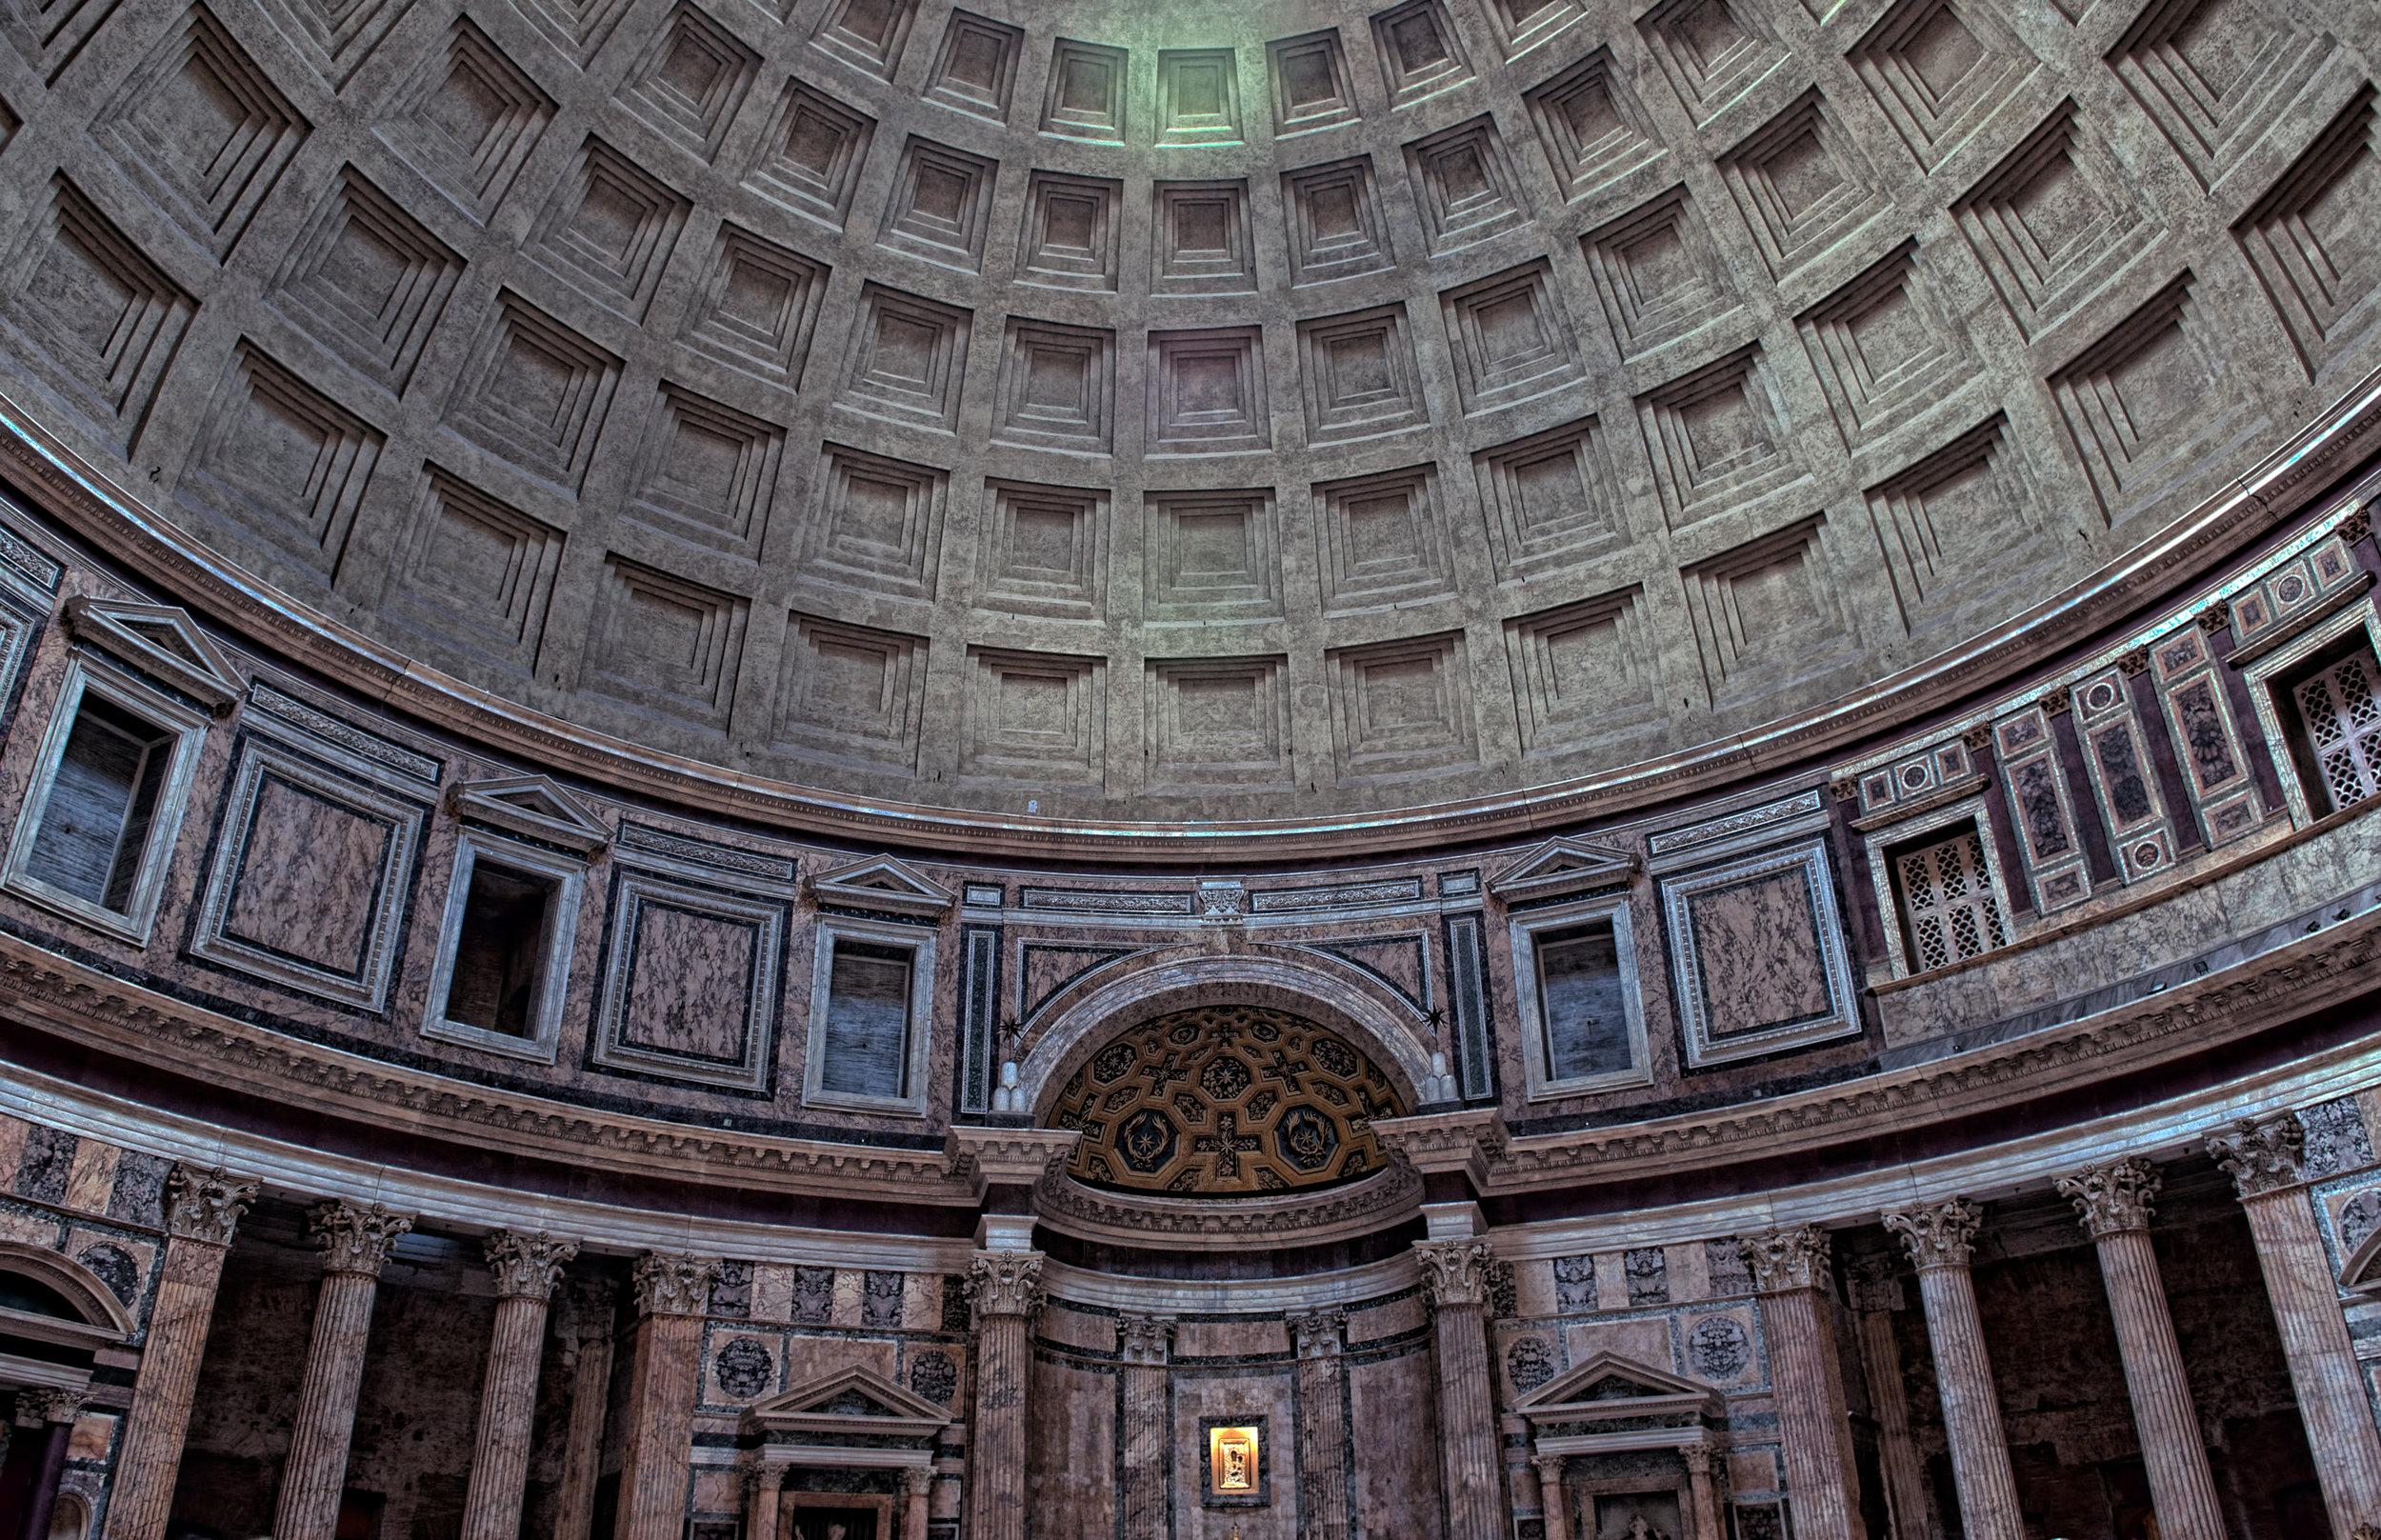 Italy-John Bardell-0510a.jpg